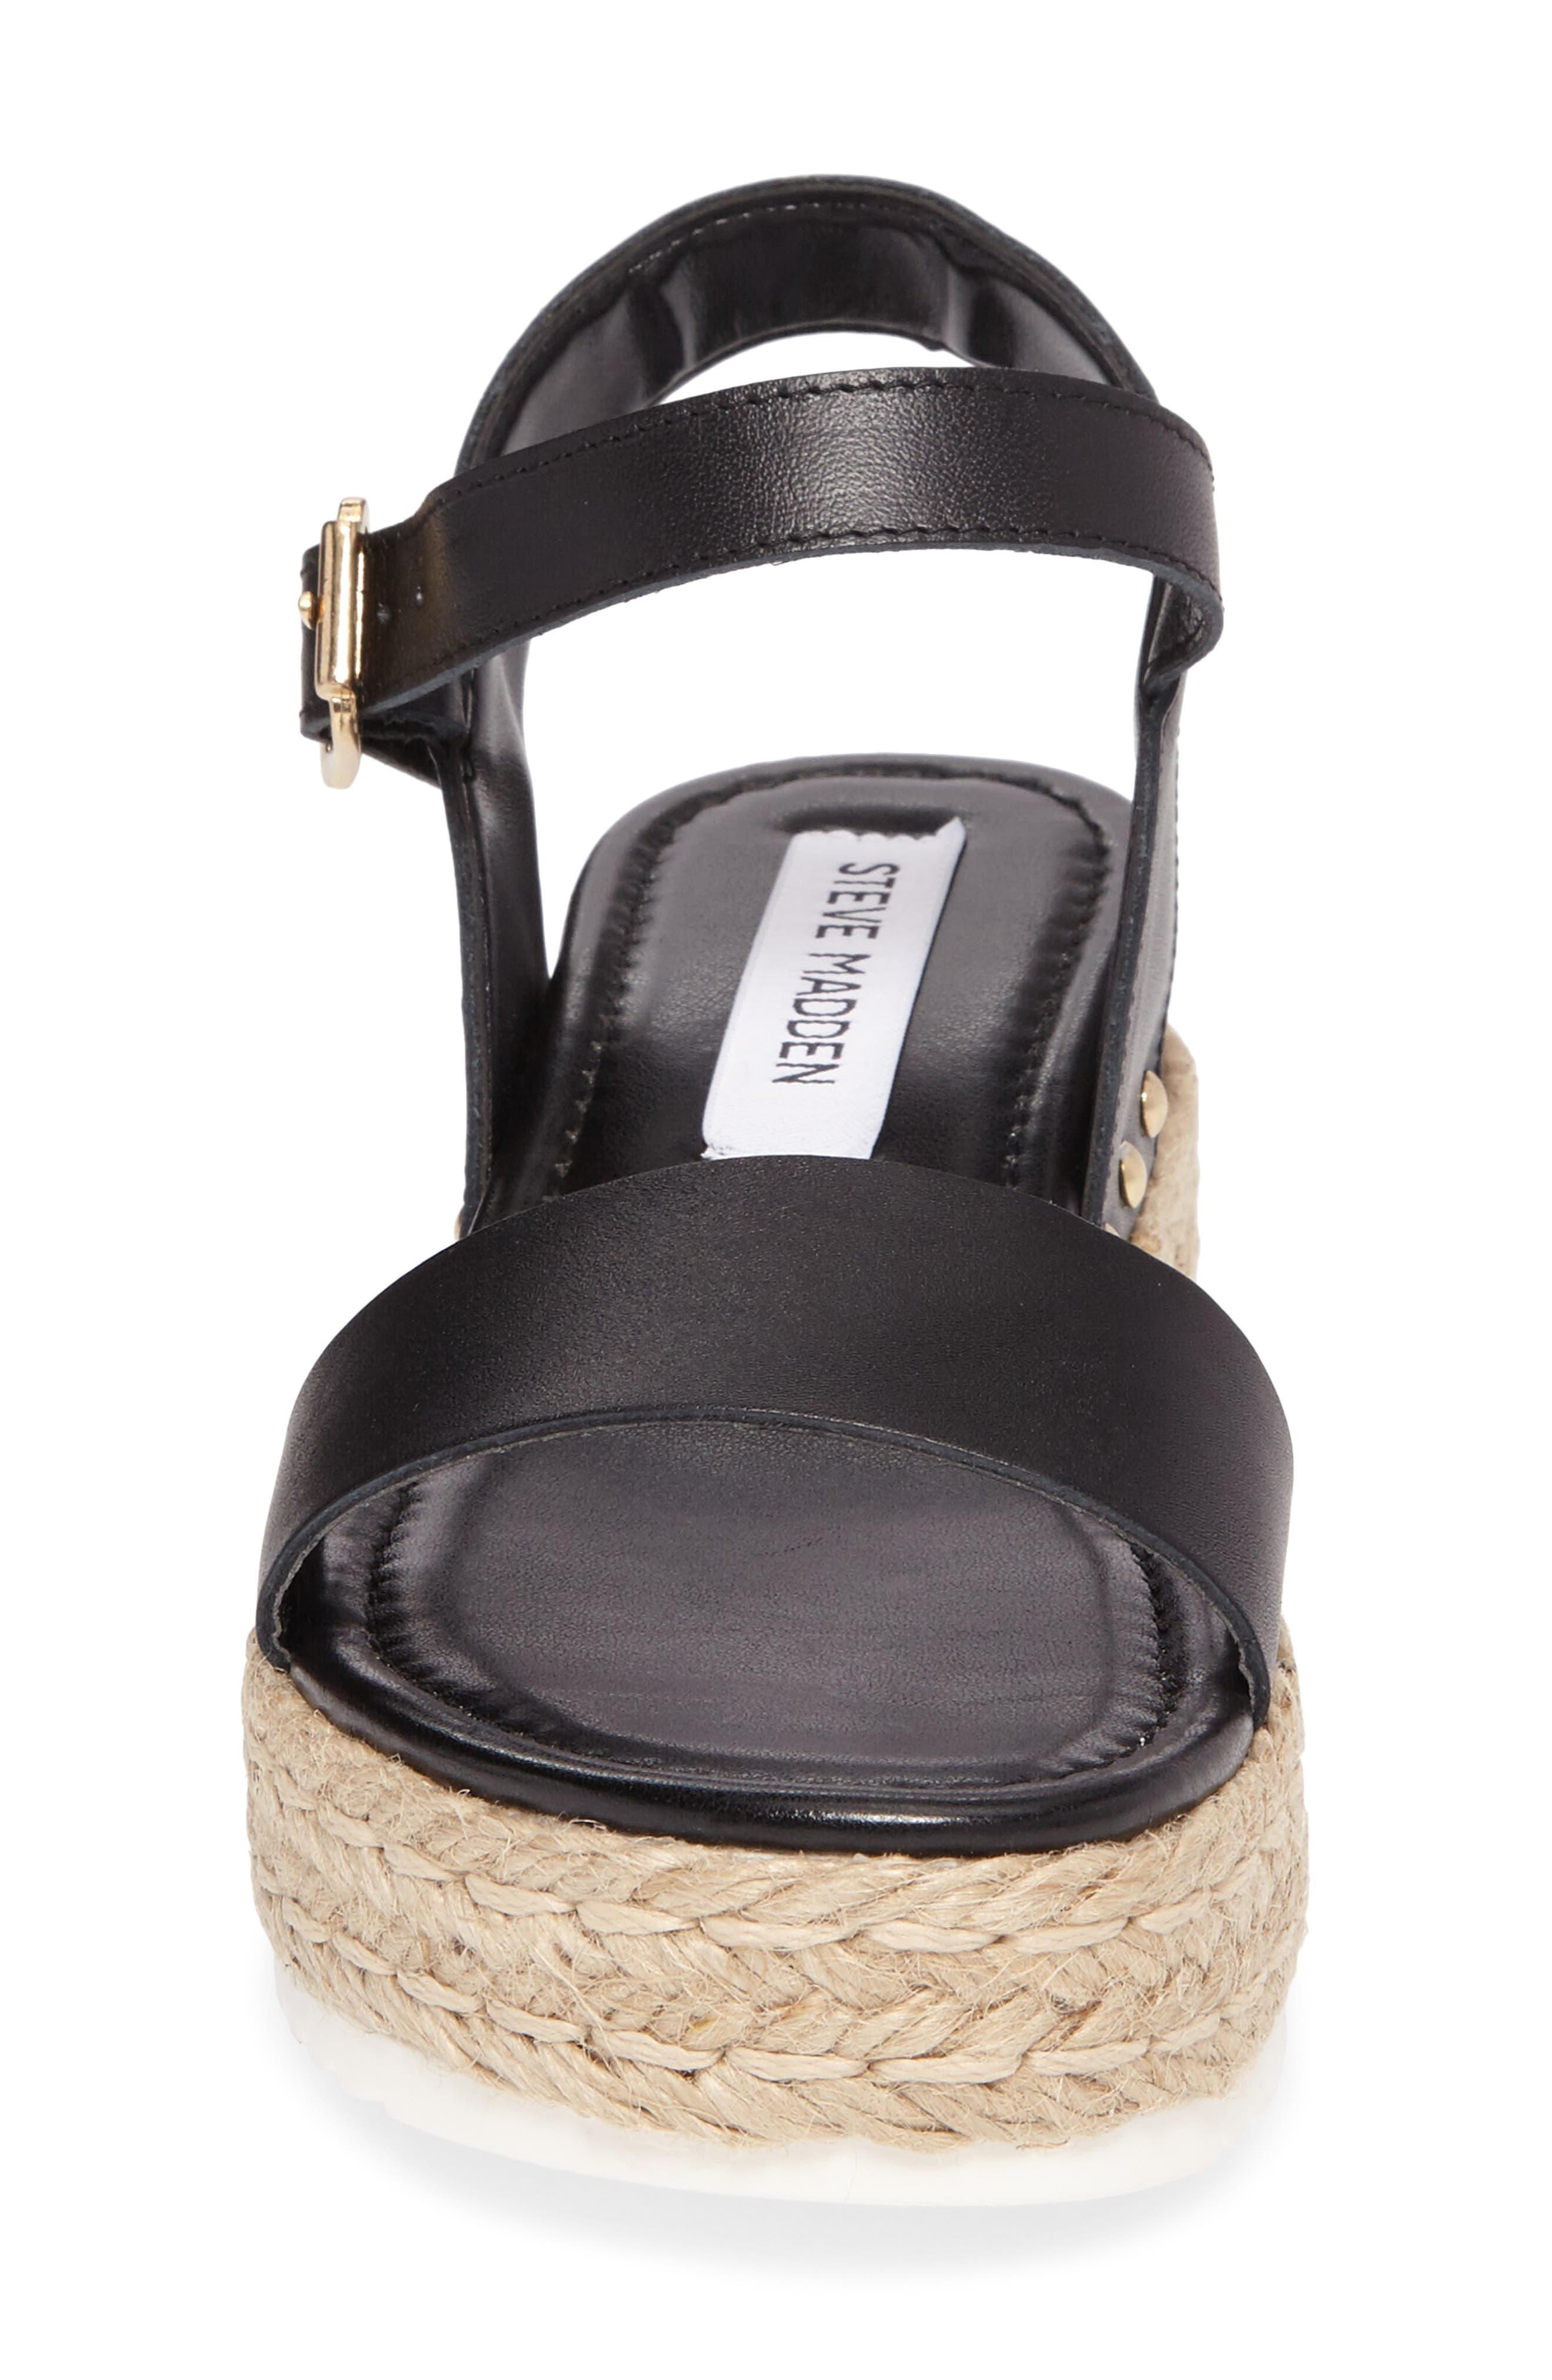 Chiara Platform Espadrille Sandal,                             Alternate thumbnail 4, color,                             Black Leather